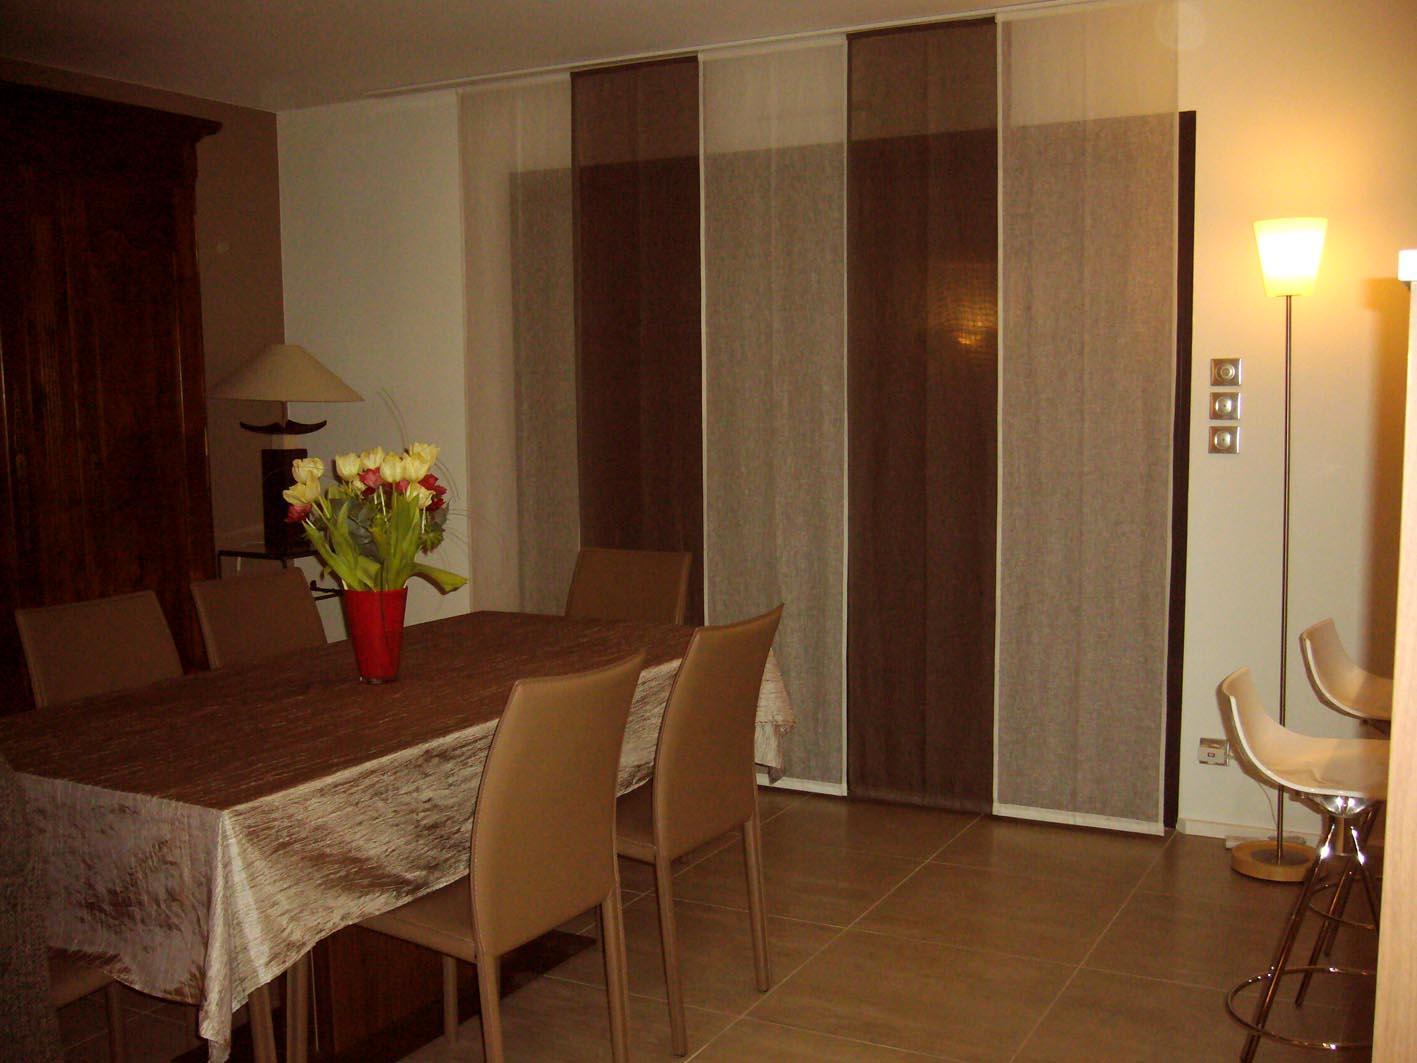 les r alisations habille ta fen tre exemples de projets. Black Bedroom Furniture Sets. Home Design Ideas